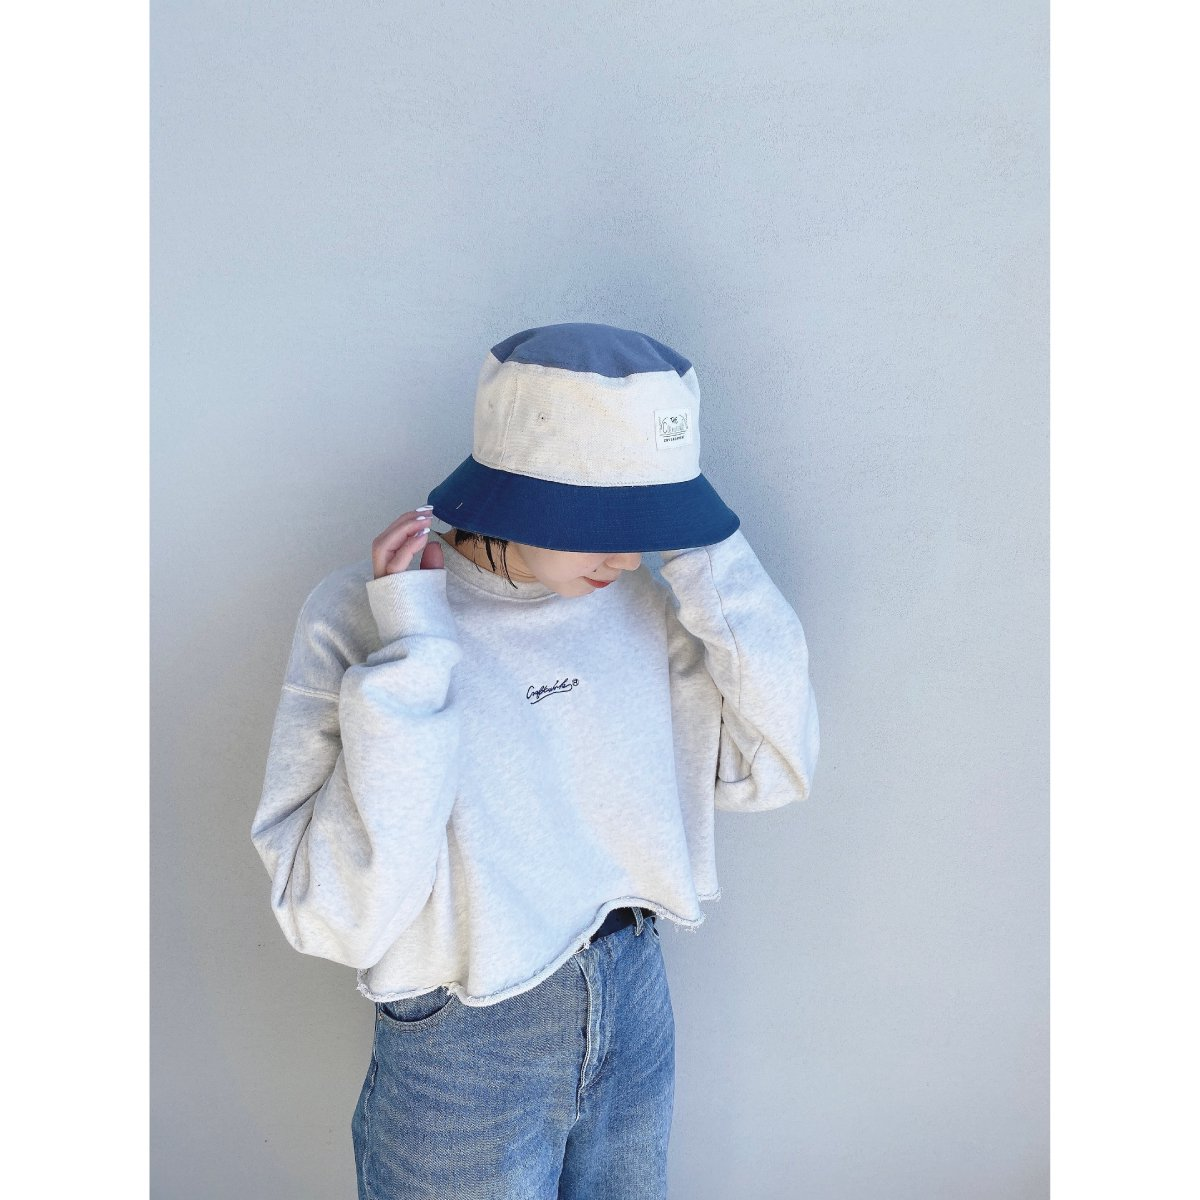 Repro Hat 詳細画像27